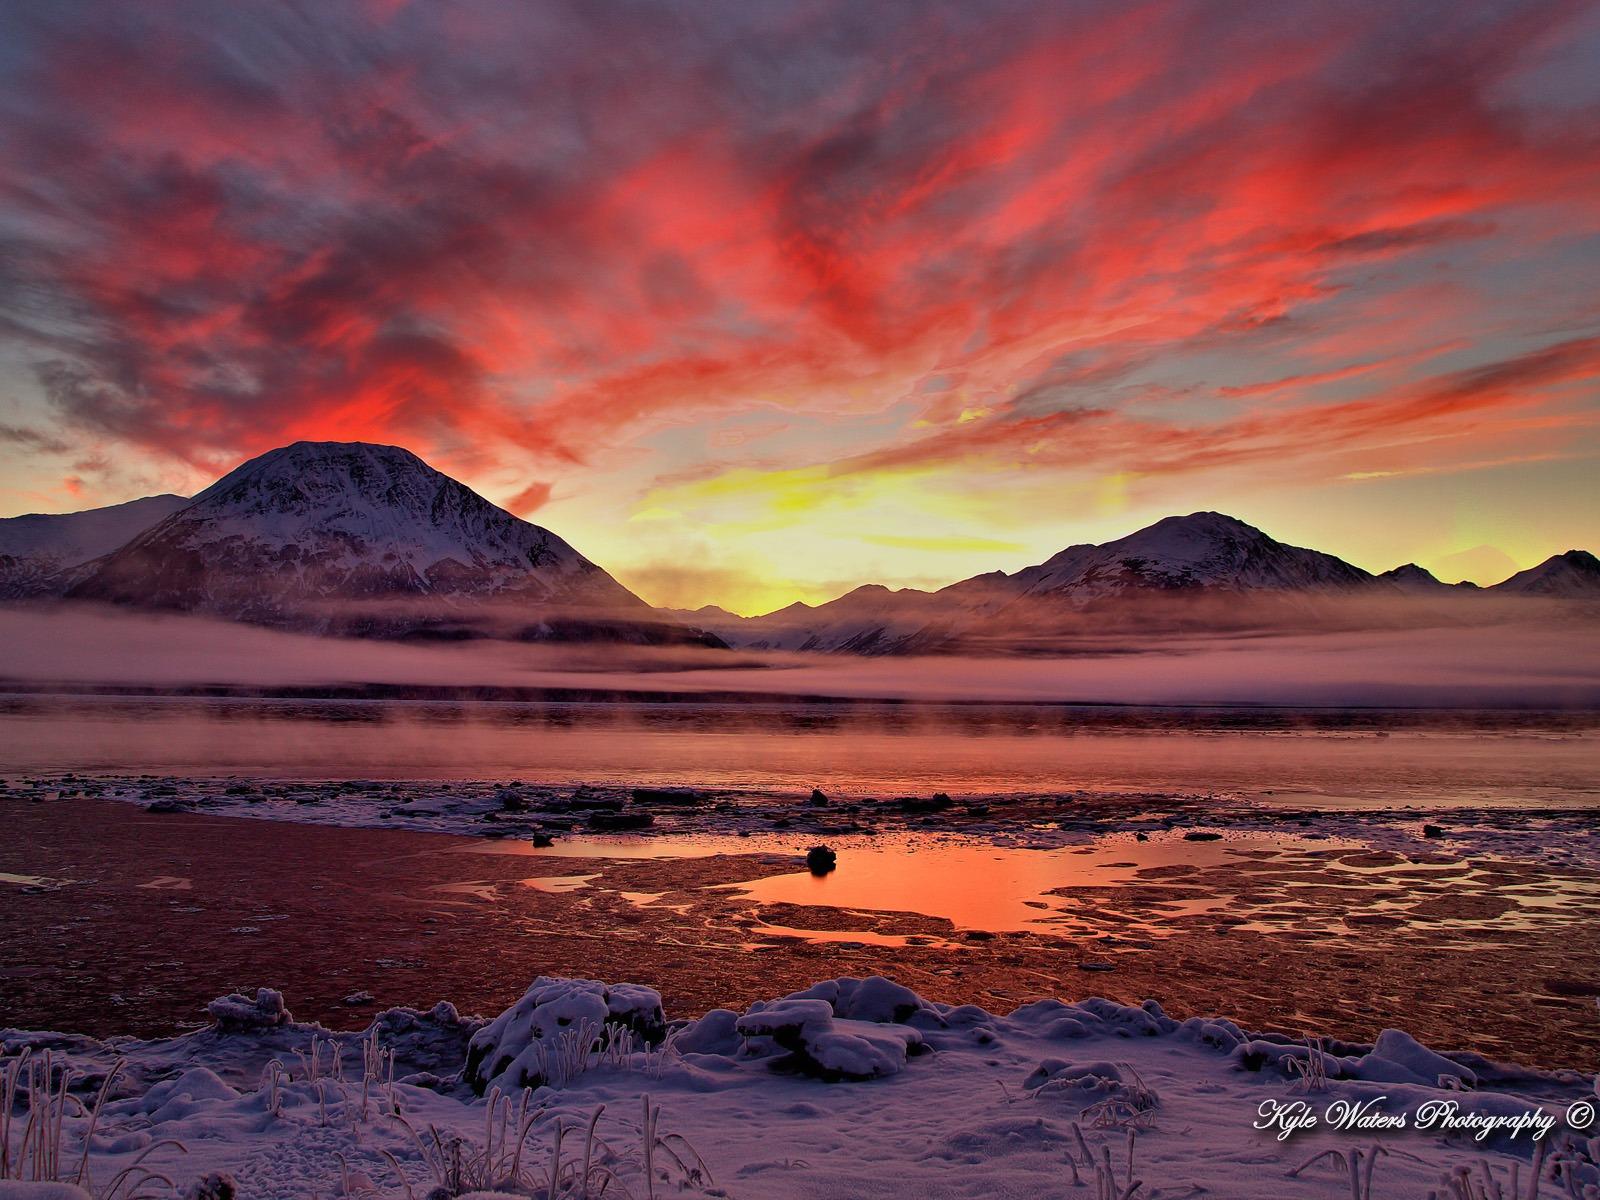 Alaska natural scenery desktop wallpaper 02   1600x1200 wallpaper 1600x1200